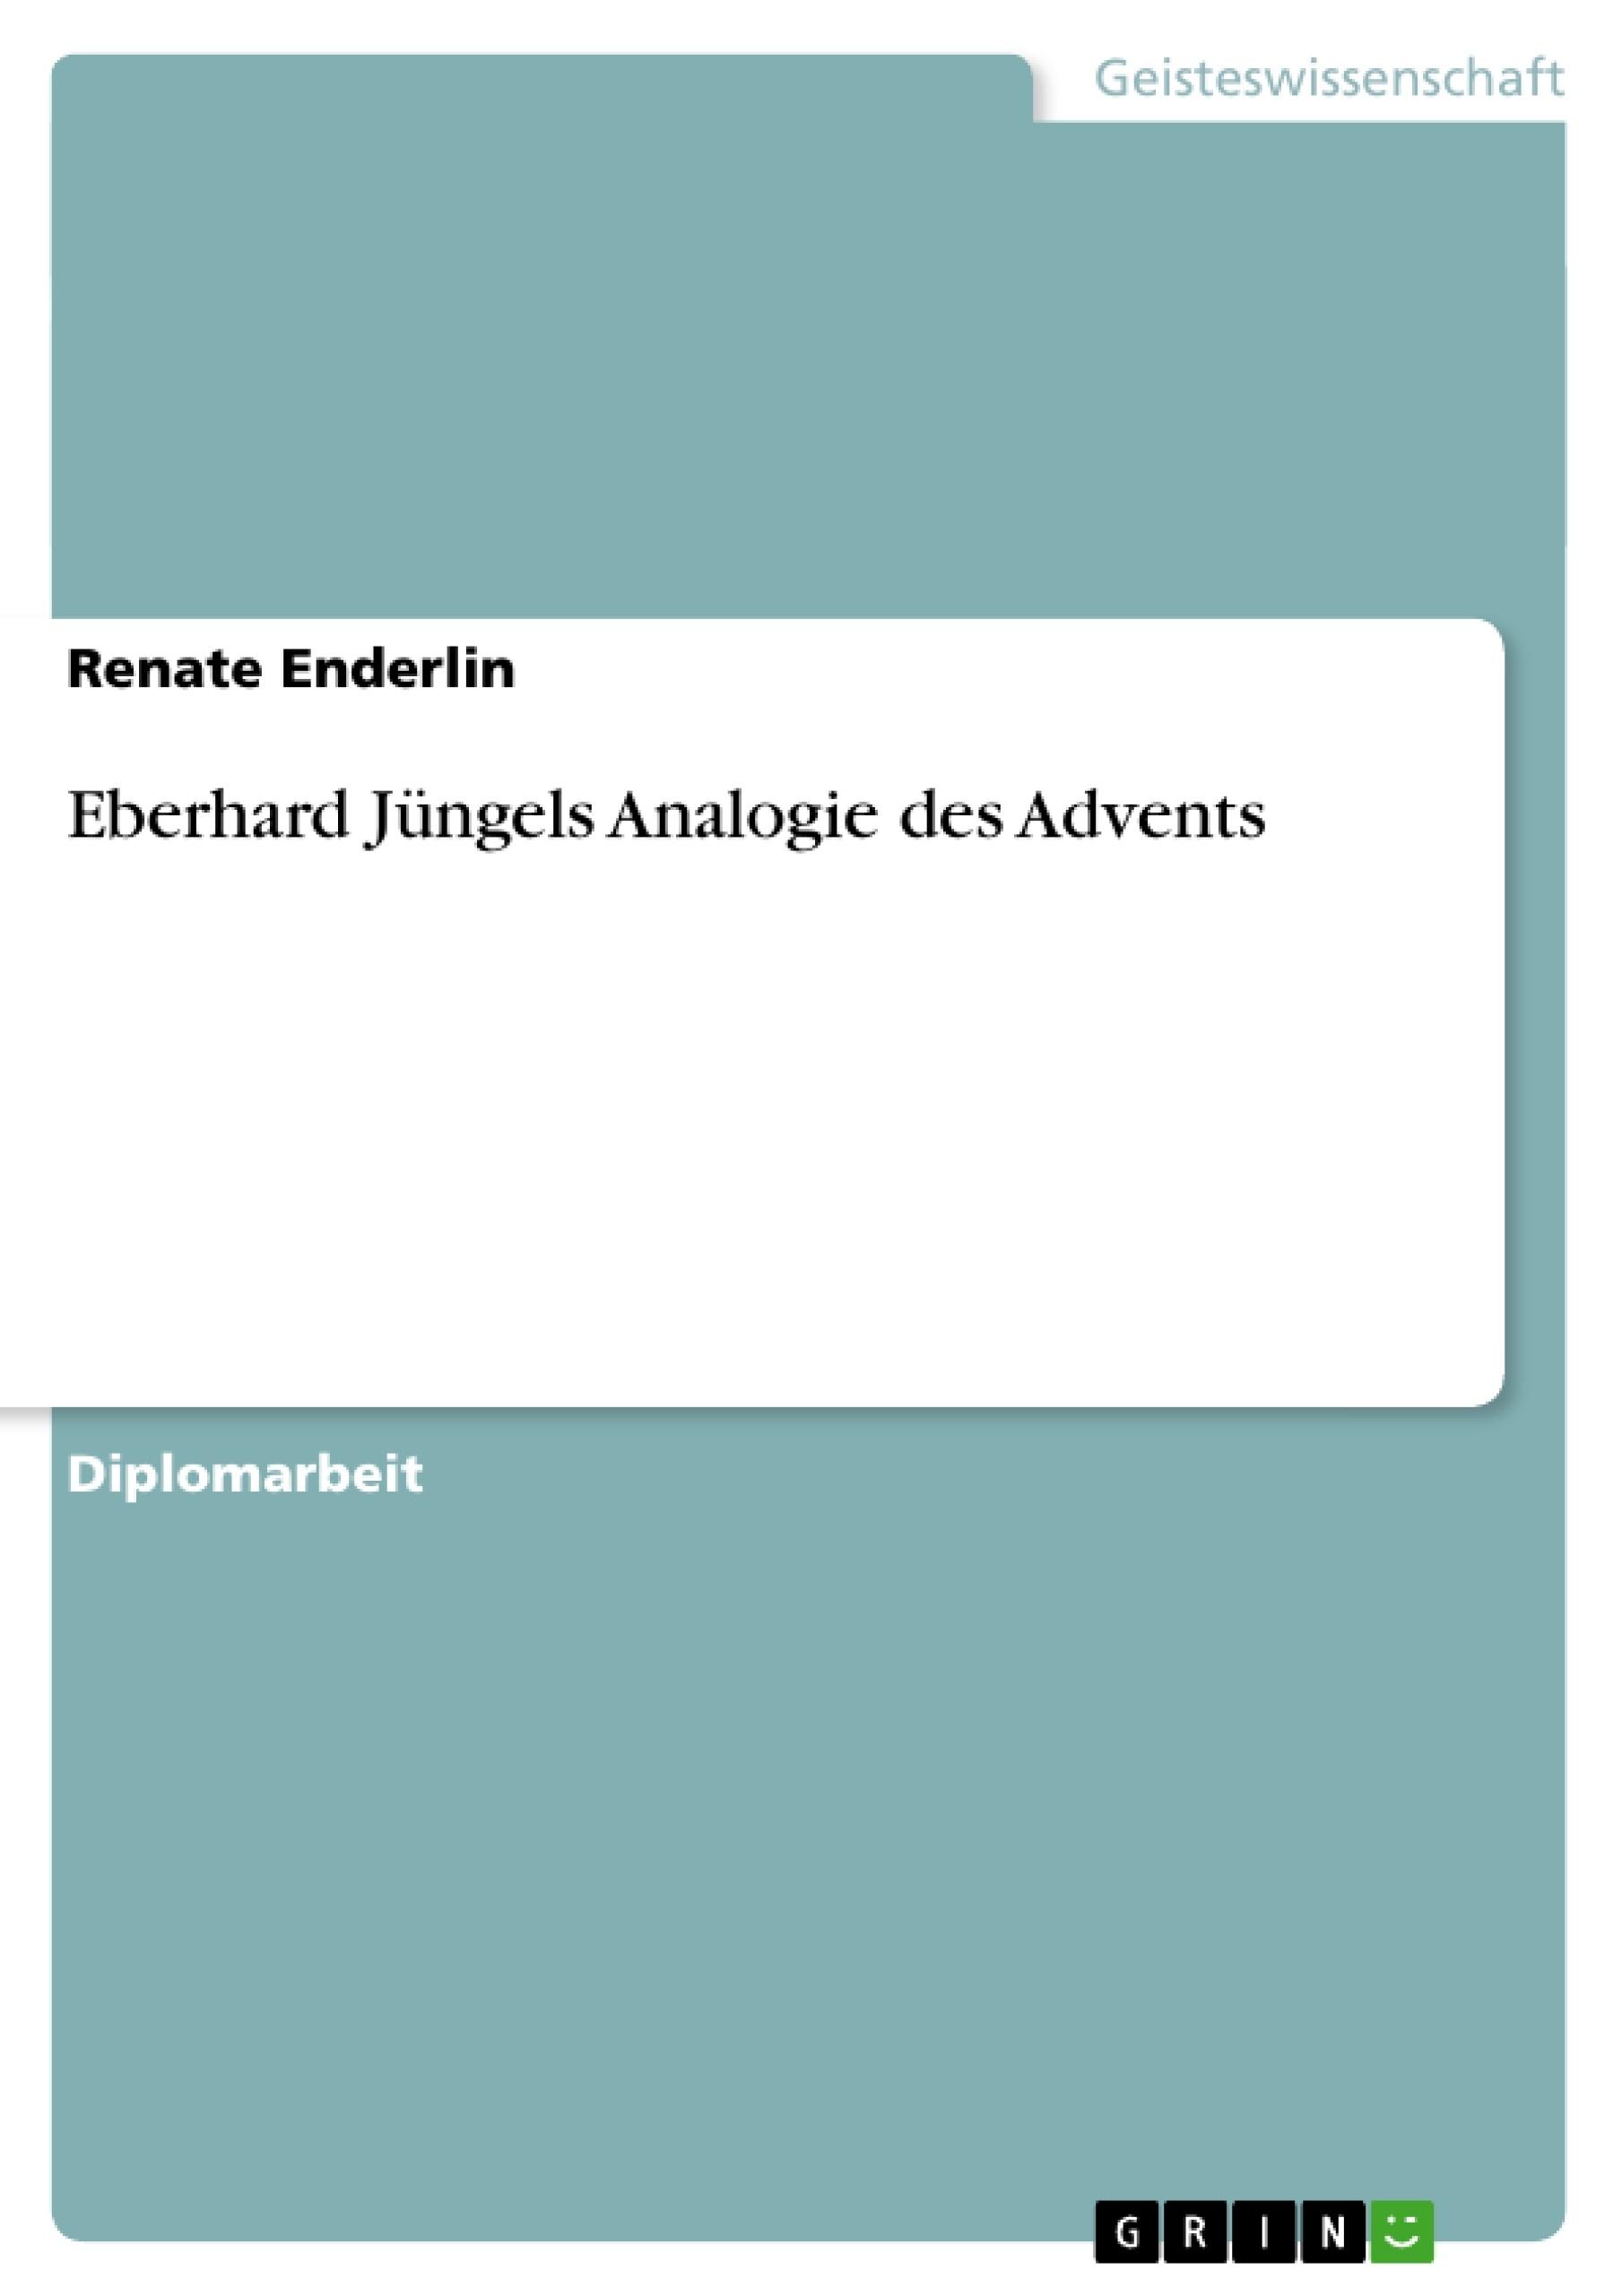 Titel: Eberhard Jüngels Analogie des Advents